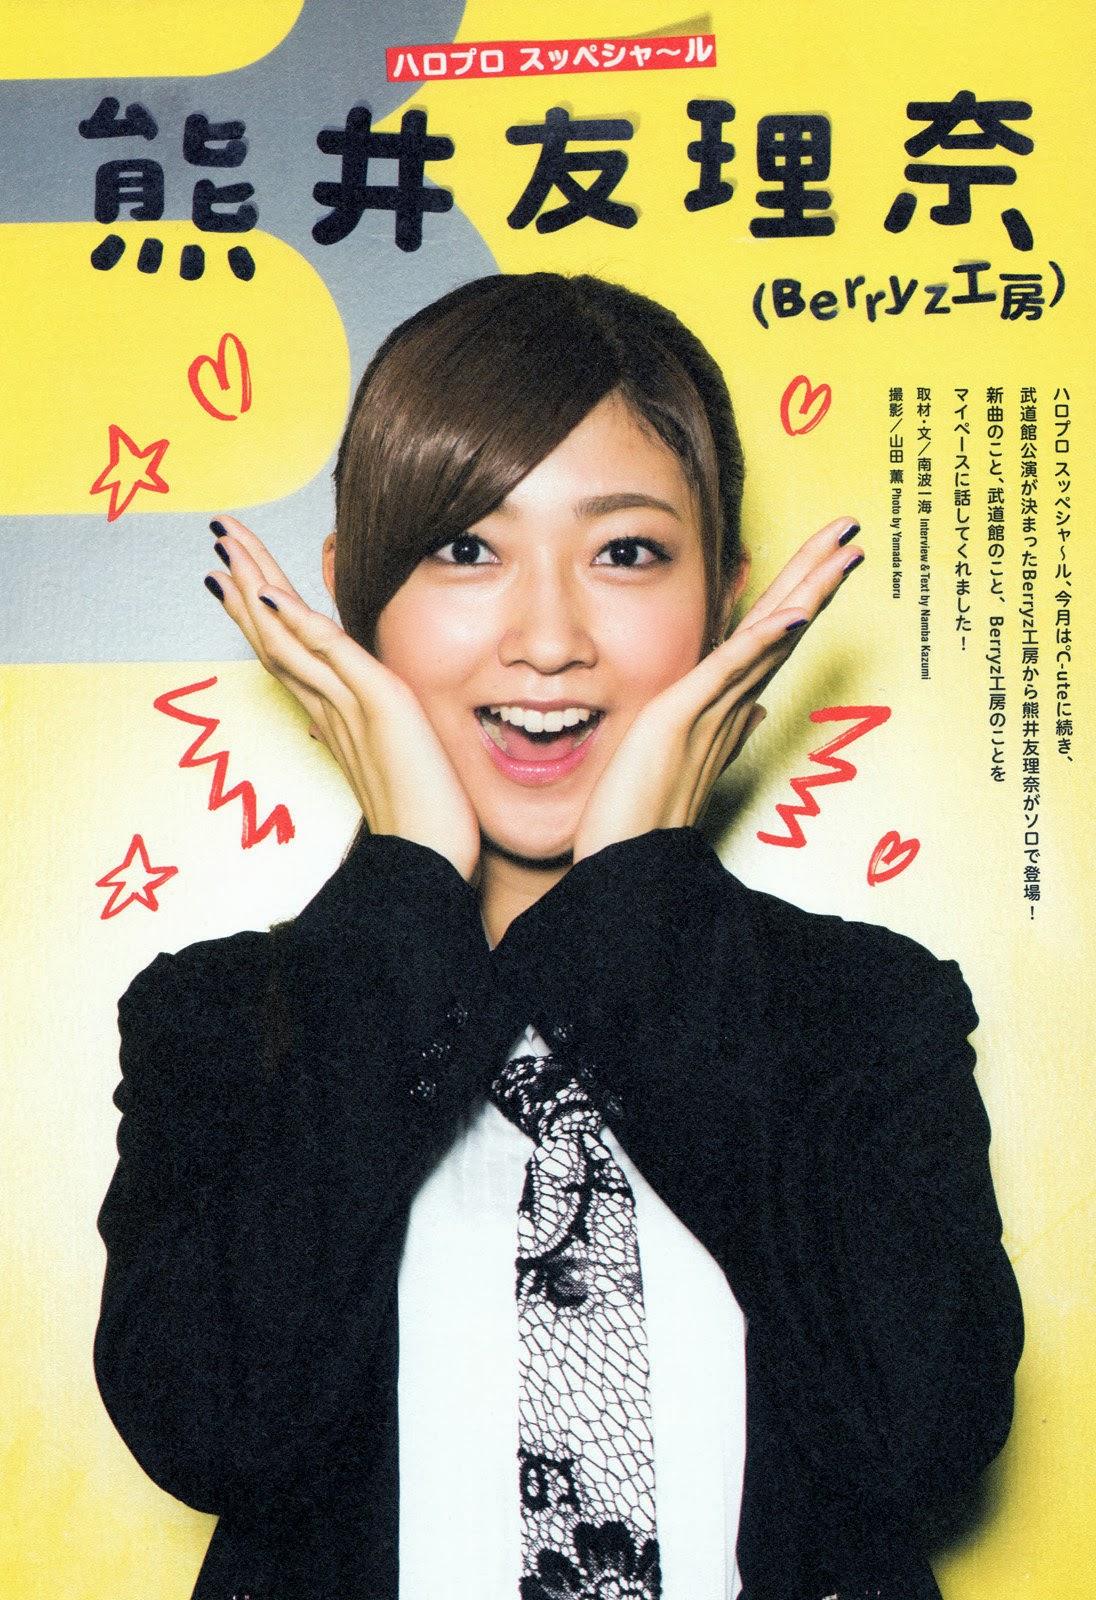 [Berryz koubou] Yurina kumai en magazine | Idols Love  [Berryz koubou]...